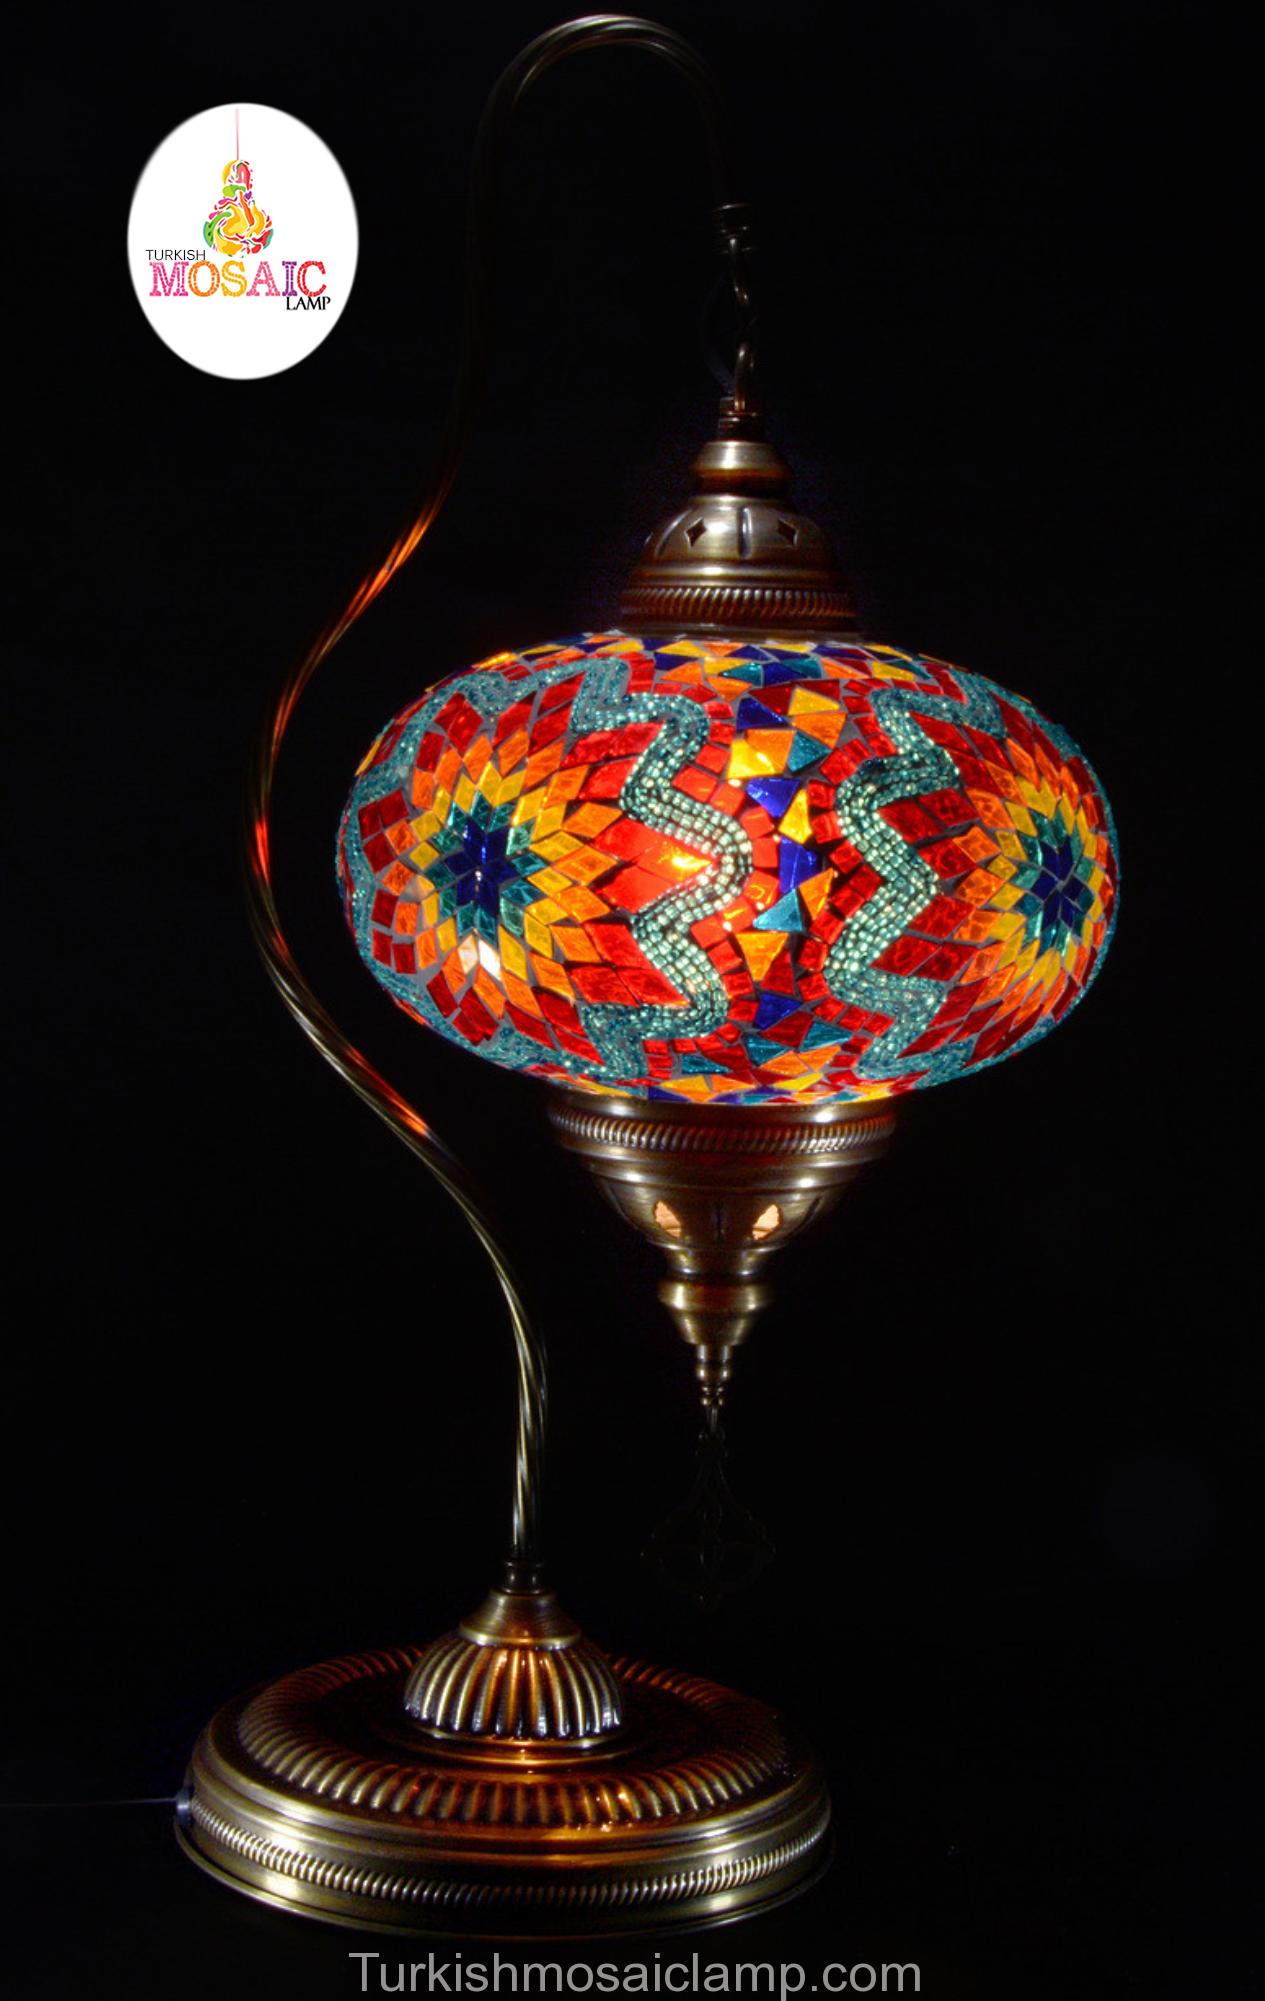 swan-neck-mosaic-lamp-size-5